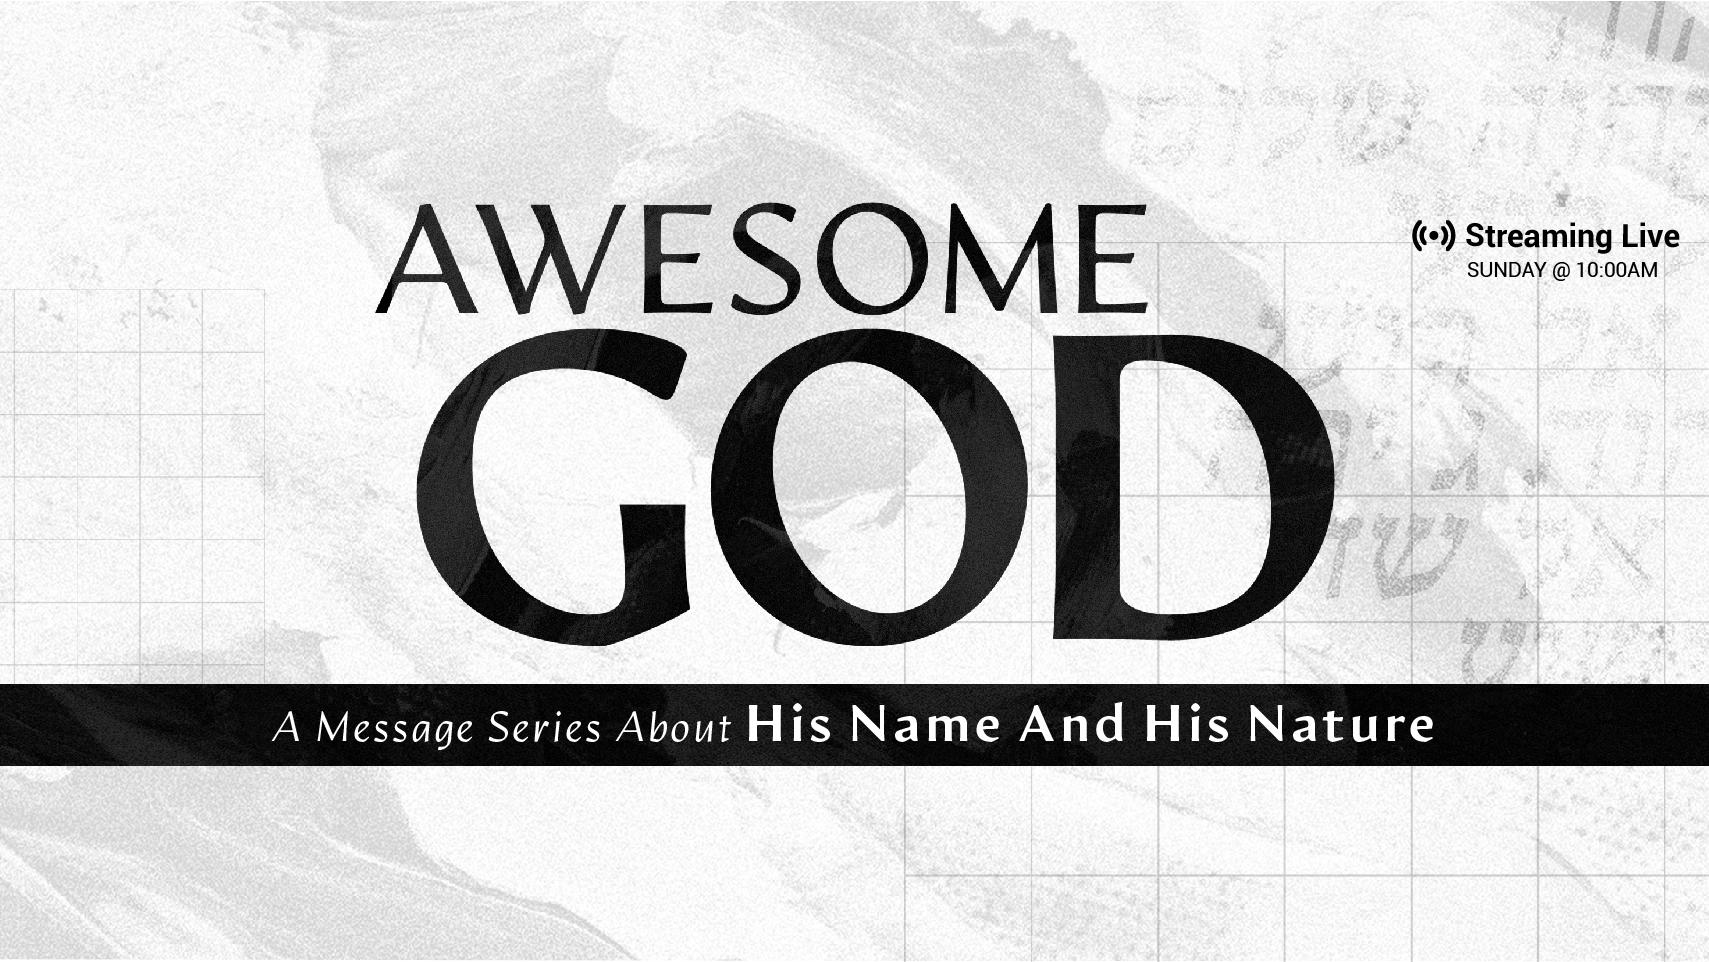 Awesome God (Part 3)